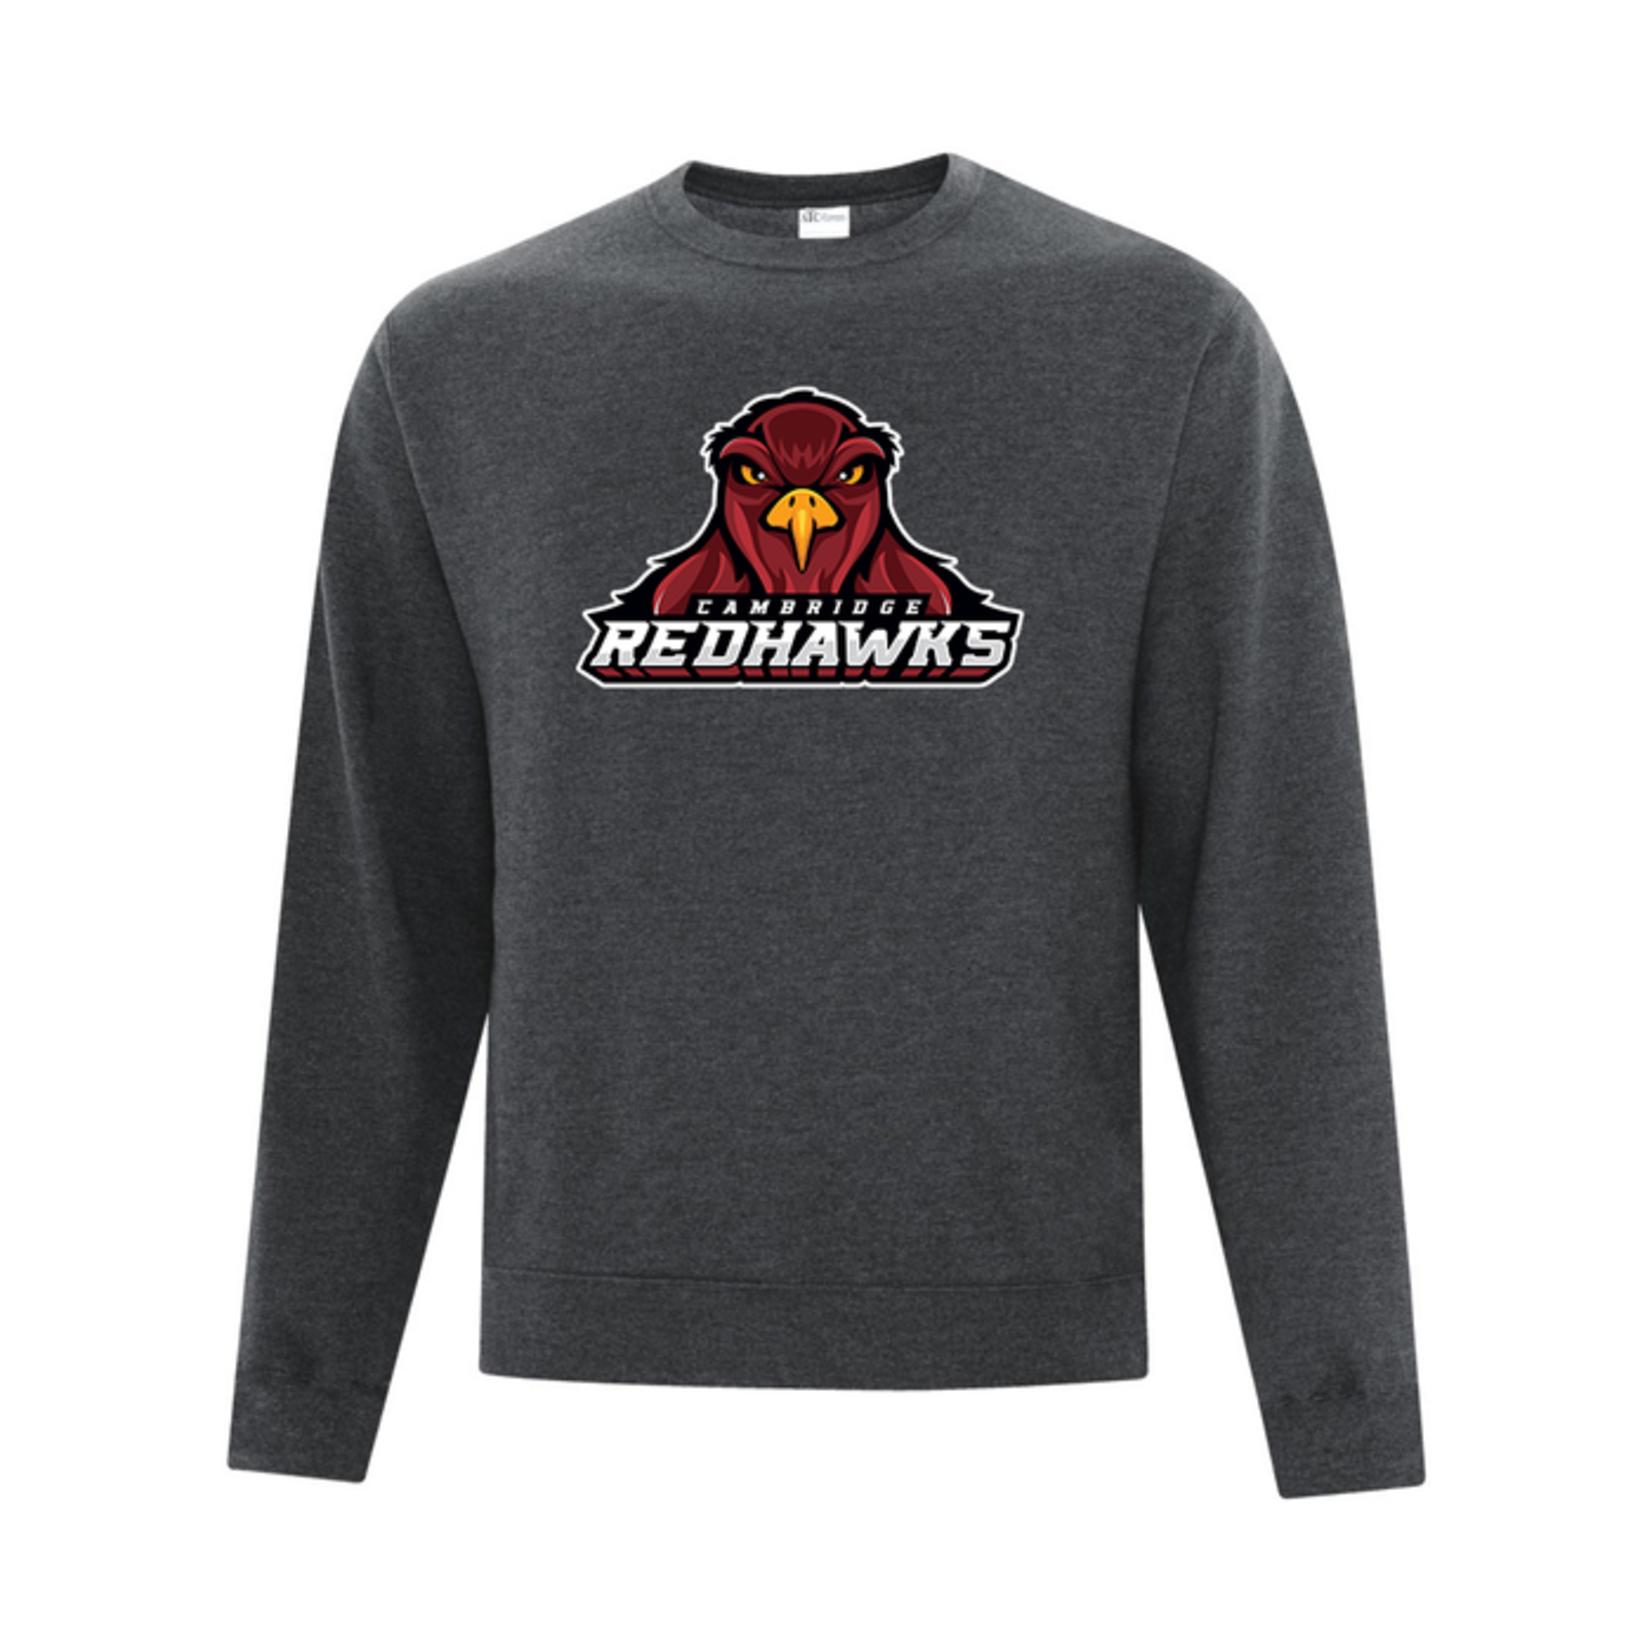 ATC Redhawks Crewneck Sweater - Adult